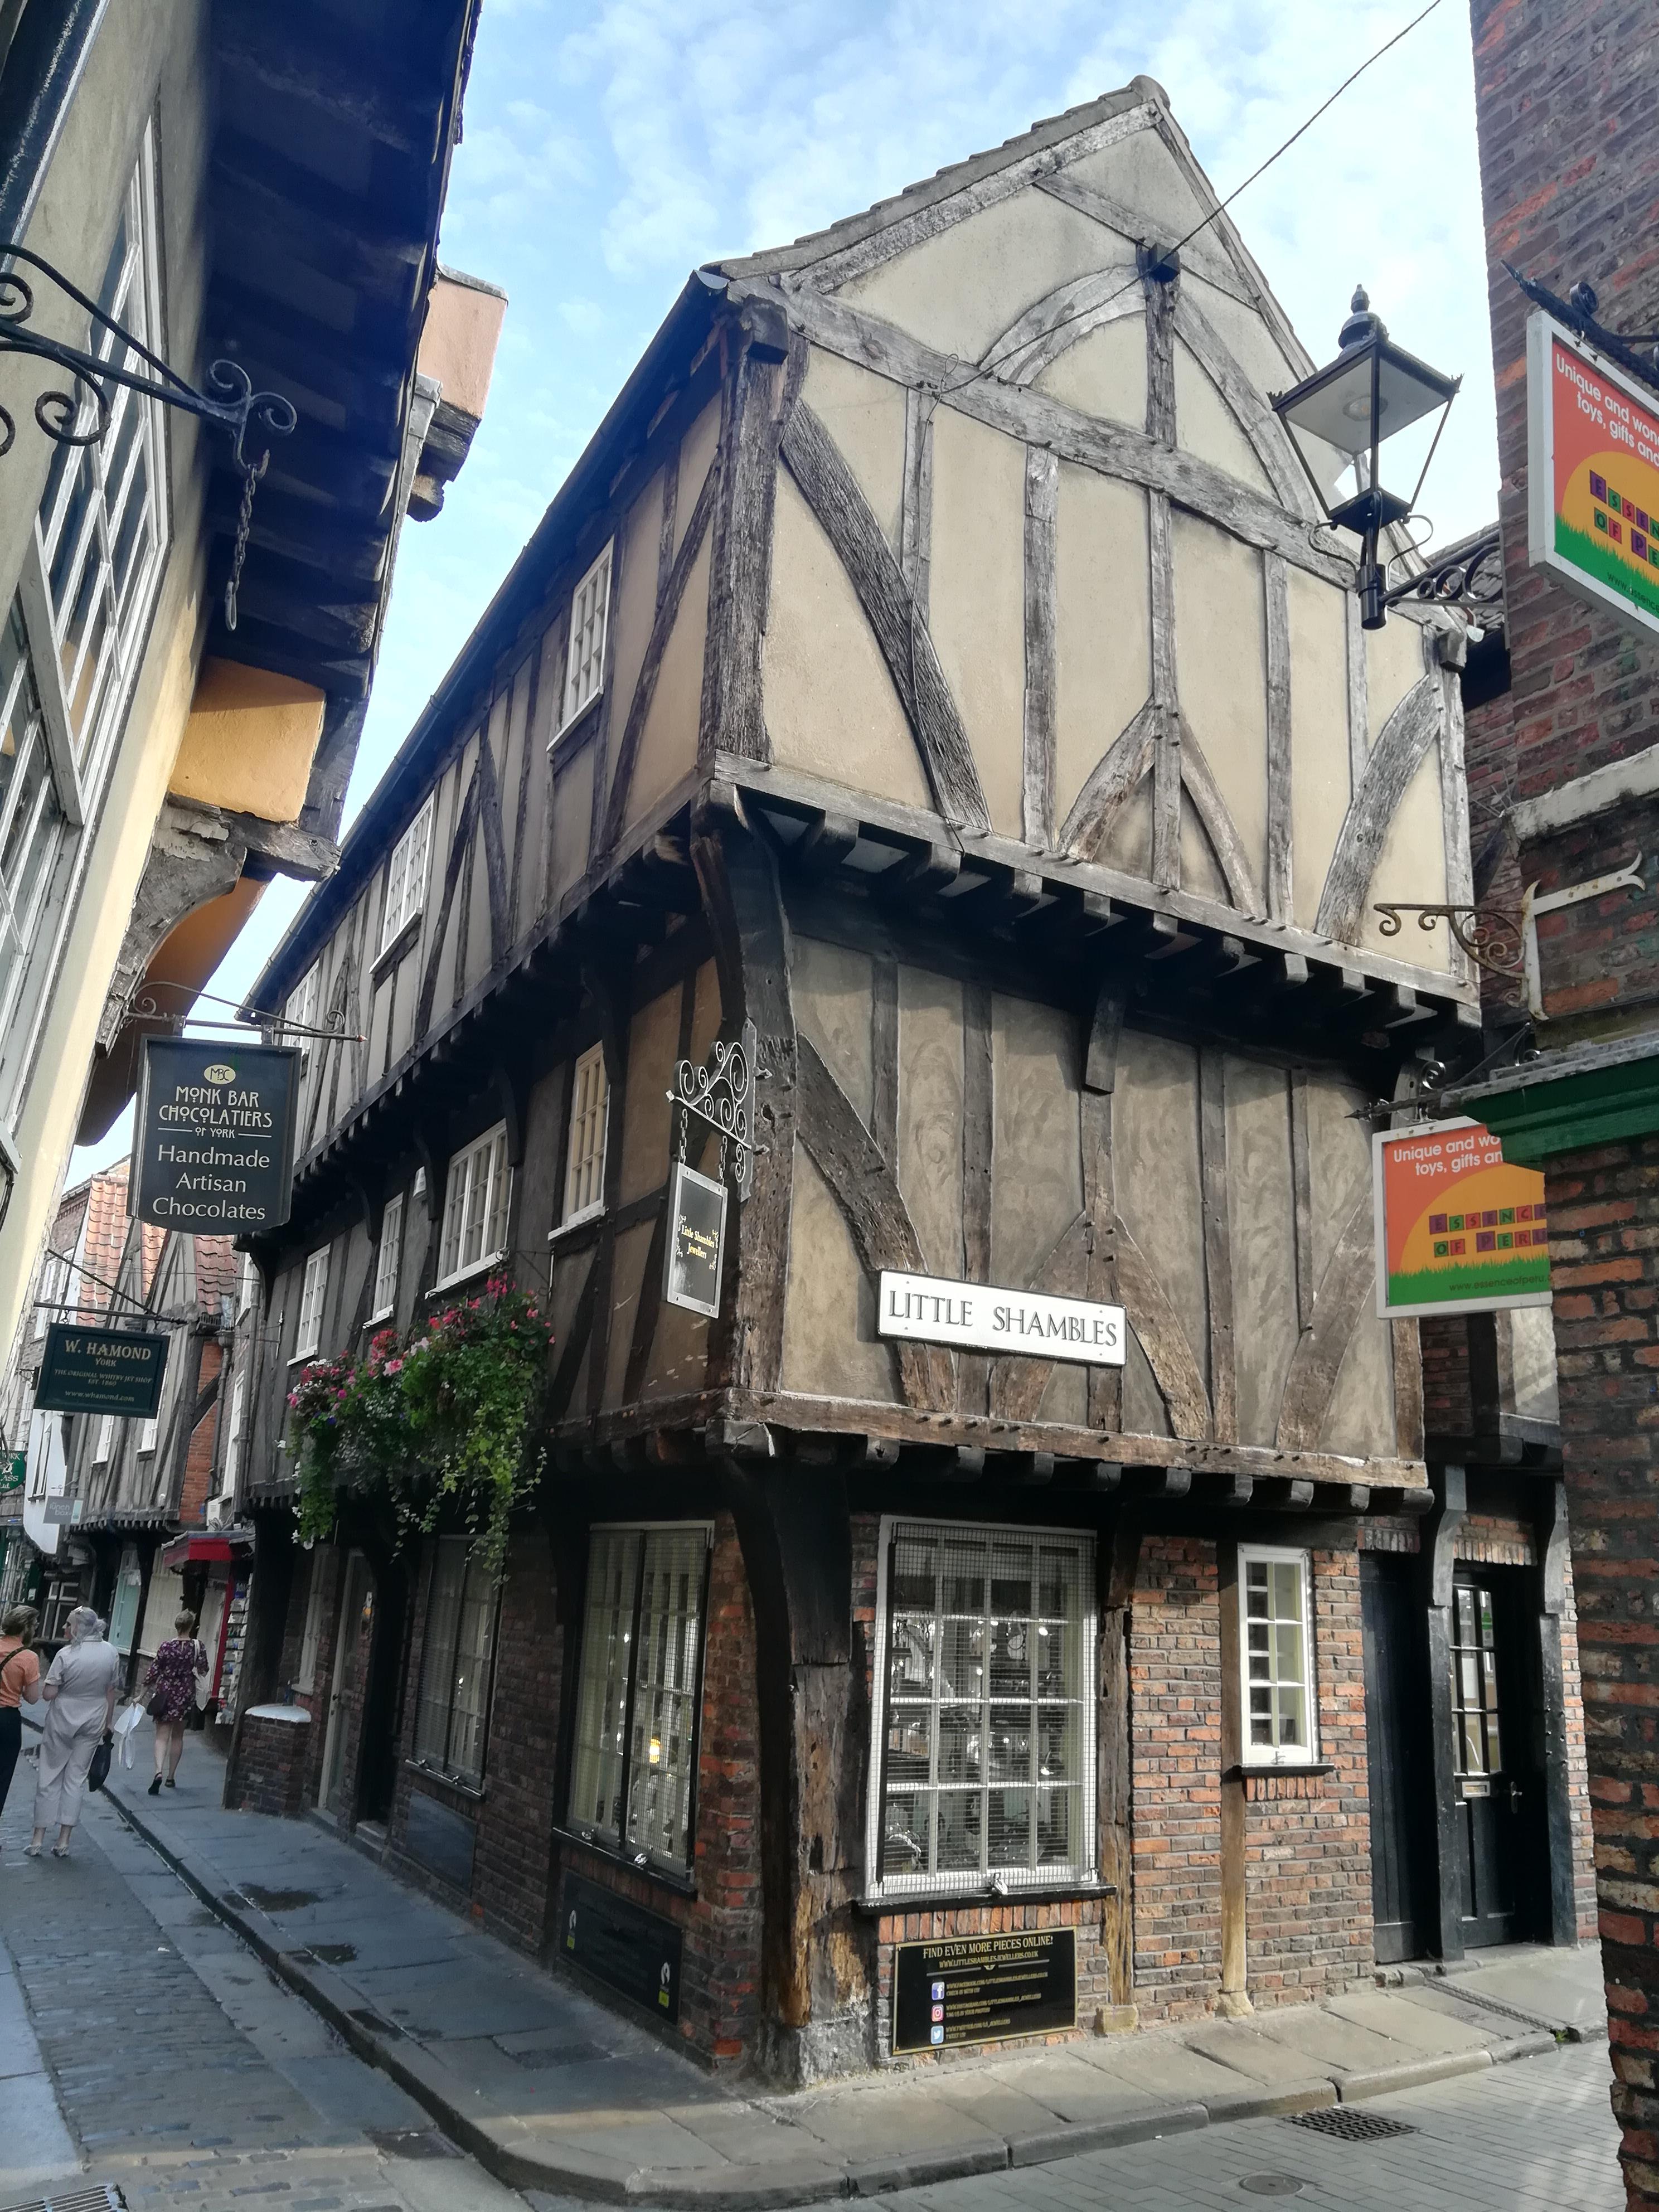 File:41 and 42 Shambles, York.jpg - Wikimedia Commons